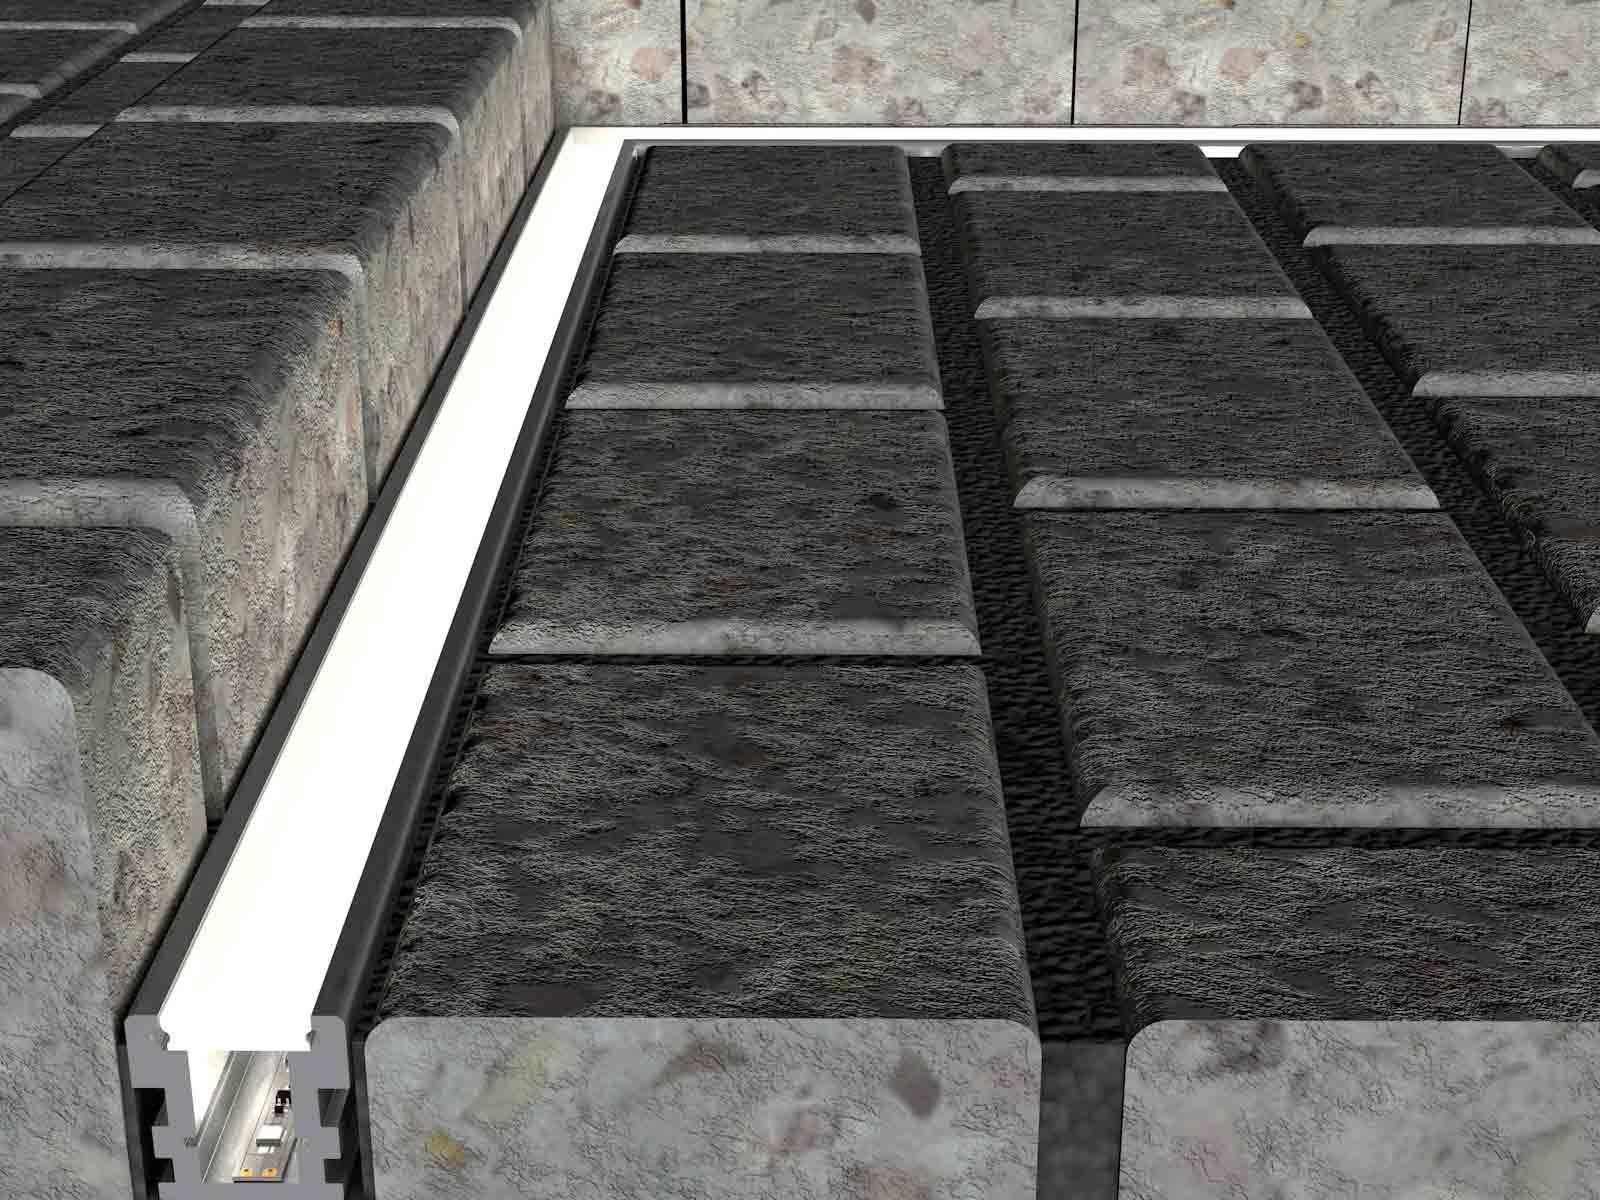 Trittfestes Tiefes Bodenprofil Ip67 Mit Satinierte 86 70 Wegbeleuchtung Beleuchtung Garten Terrassenbeleuchtung